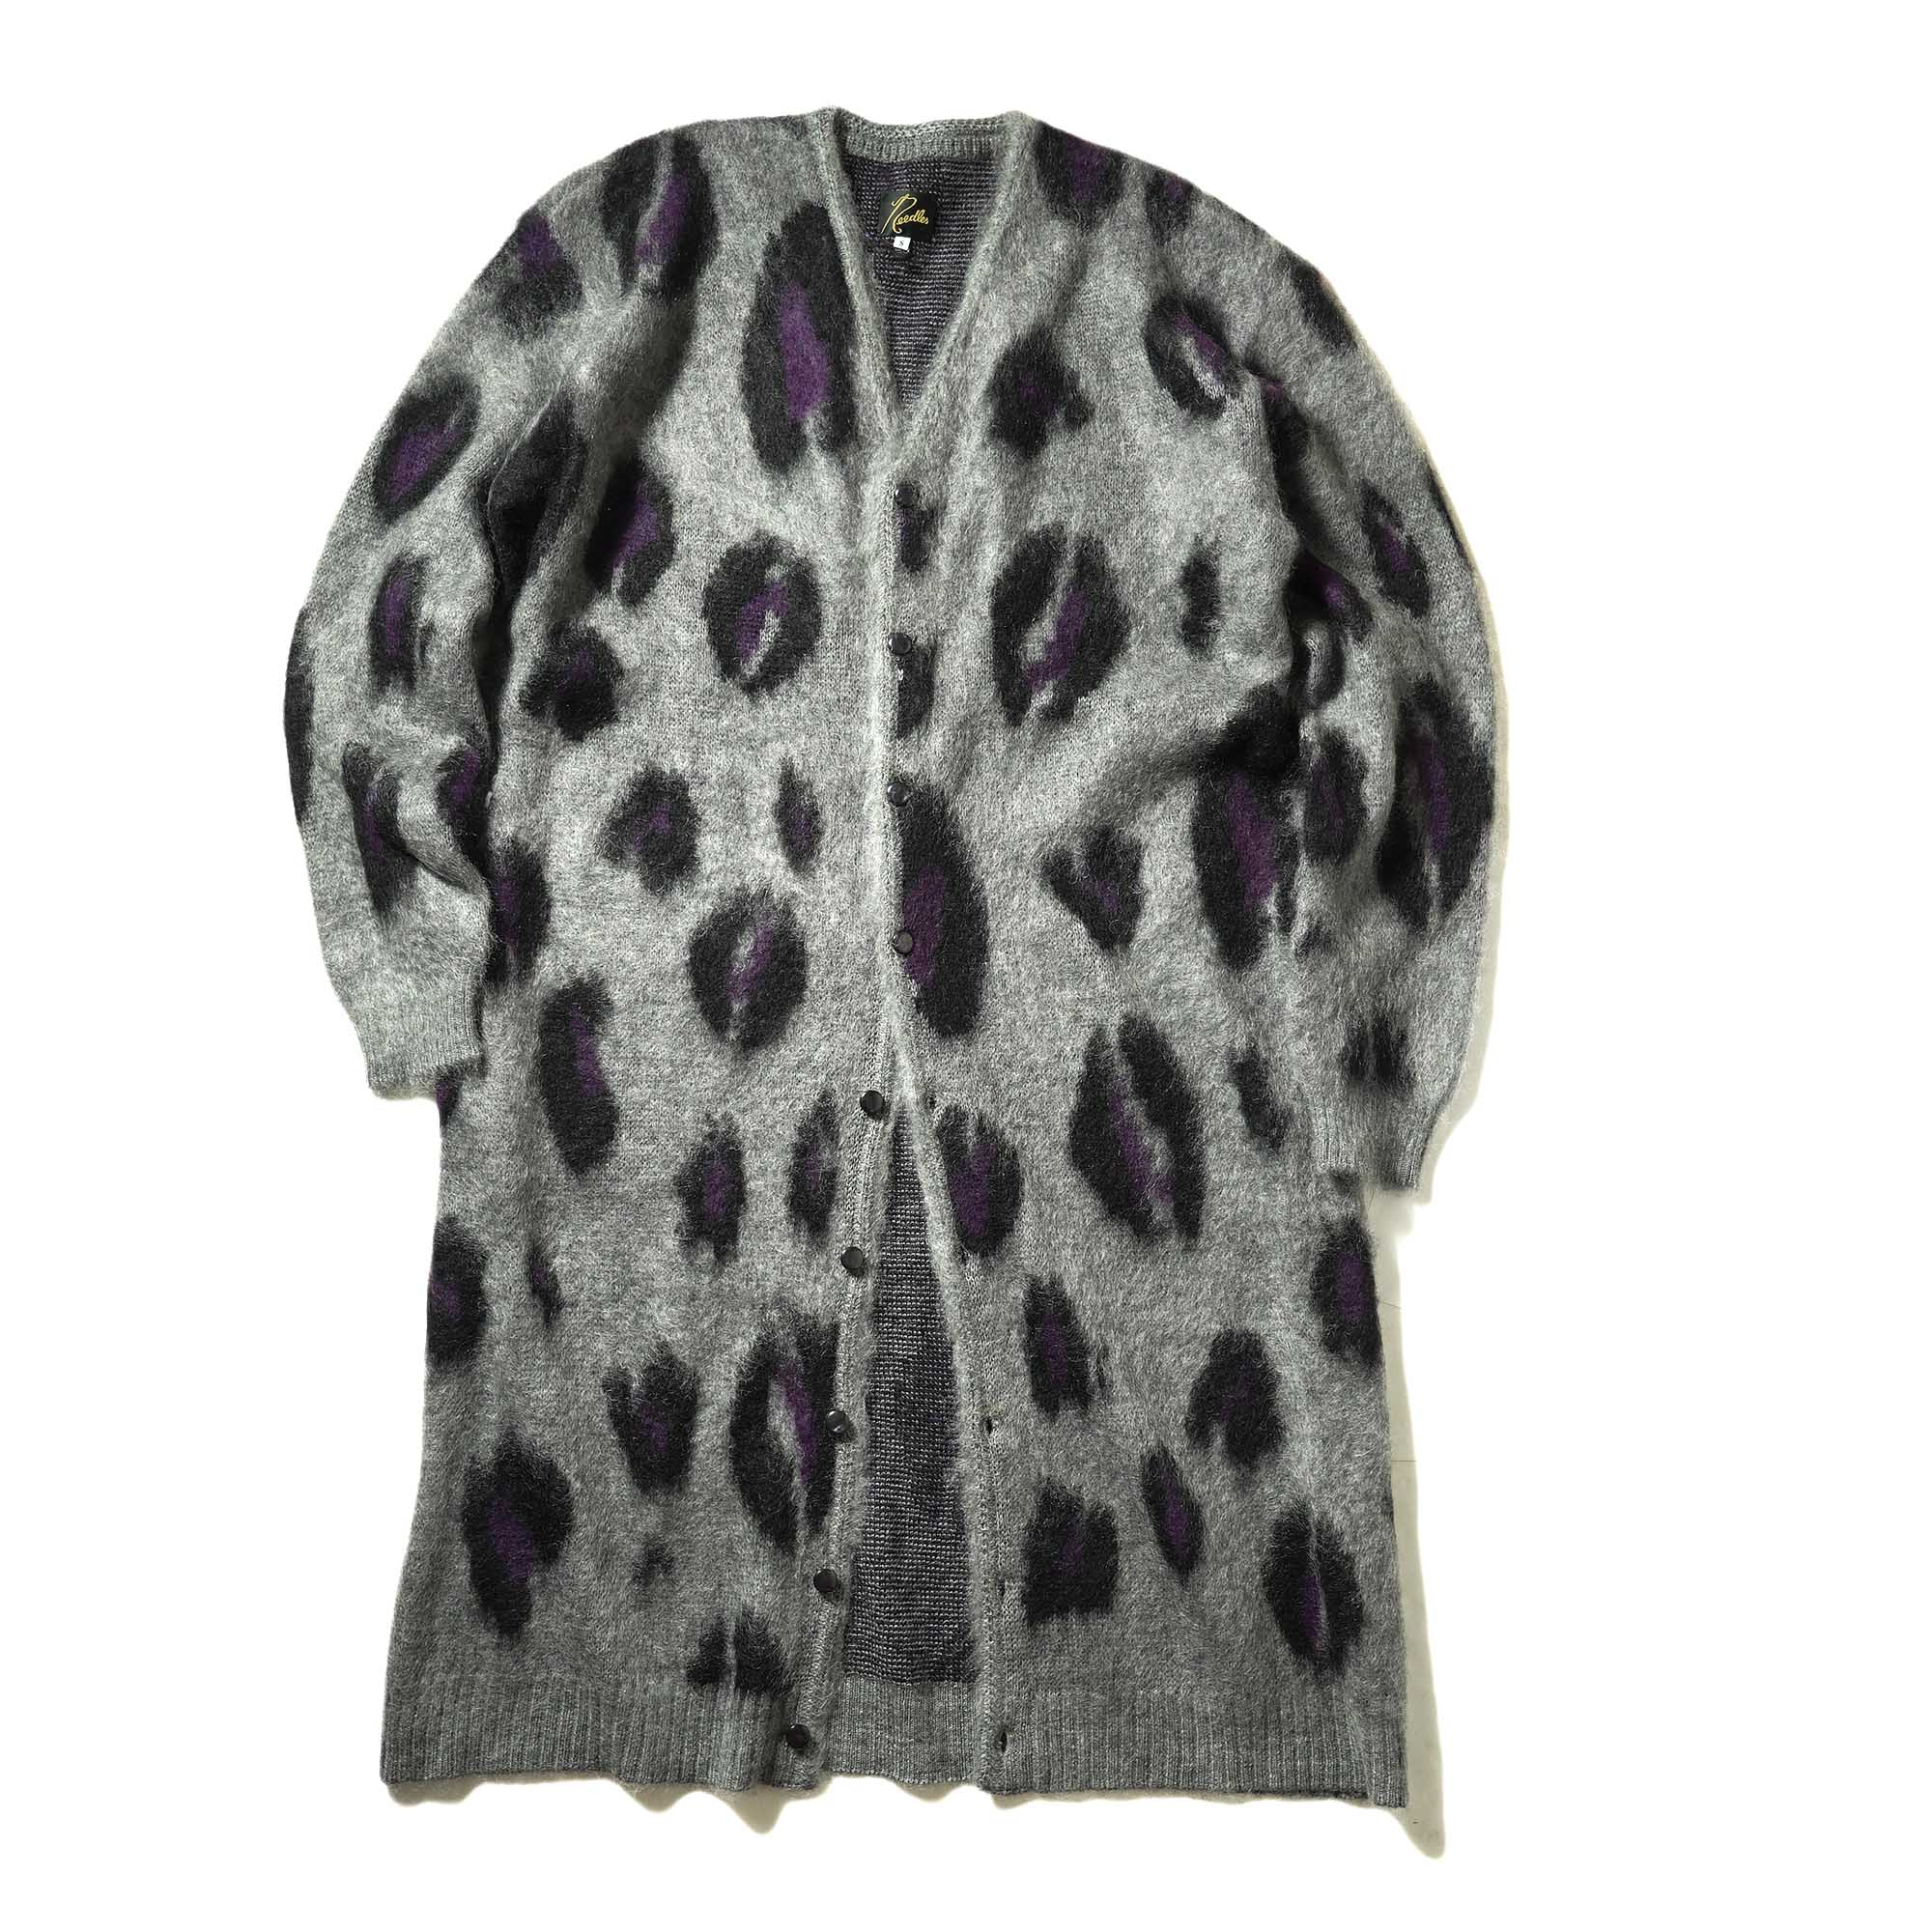 Needles / MOHAIR CARDIGAN -WindowpaneNeedles / MOHAIR LONG CARDIGAN - Leopard